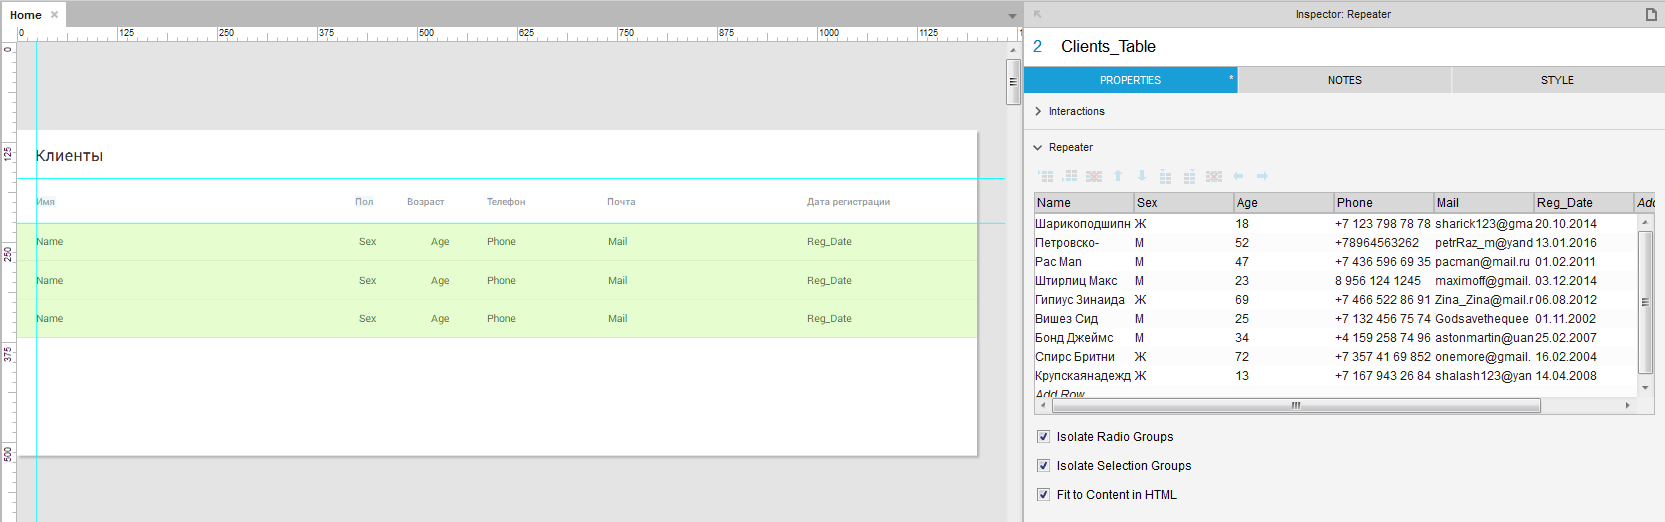 Прототипируем таблицу в Axure - 5